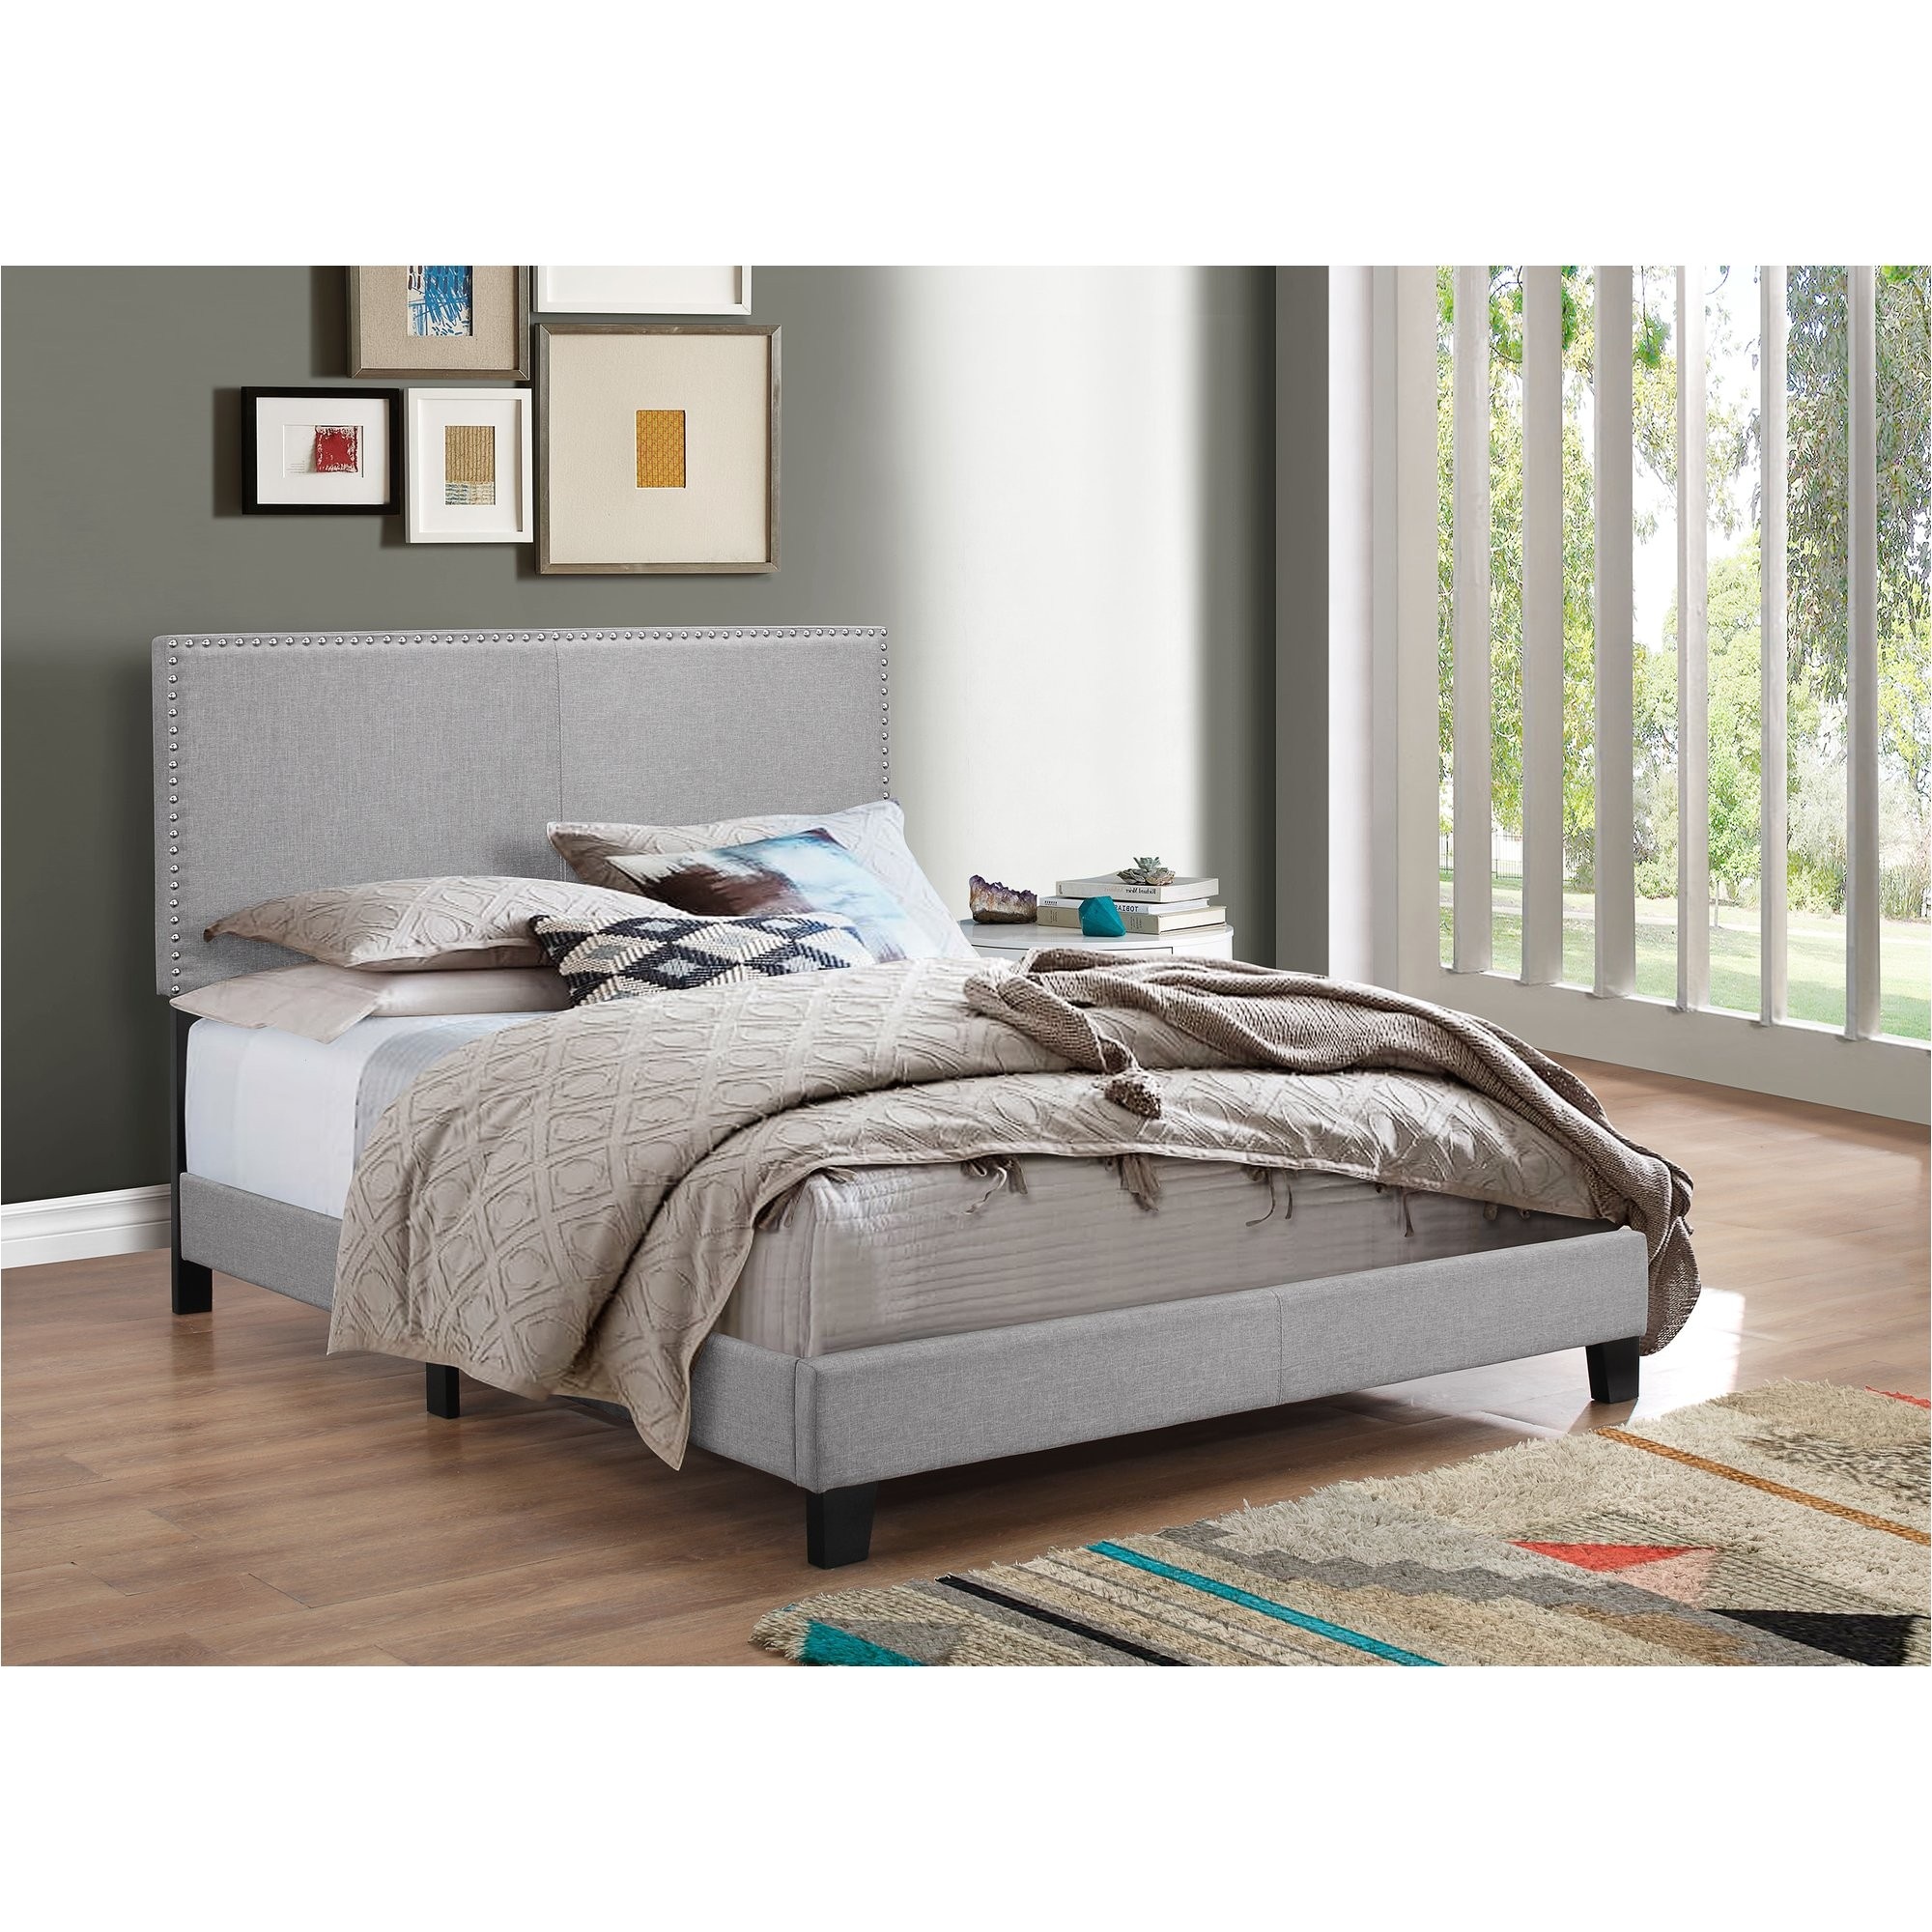 crown mark erin upholstered panel bed lmdw1087 refid sbp